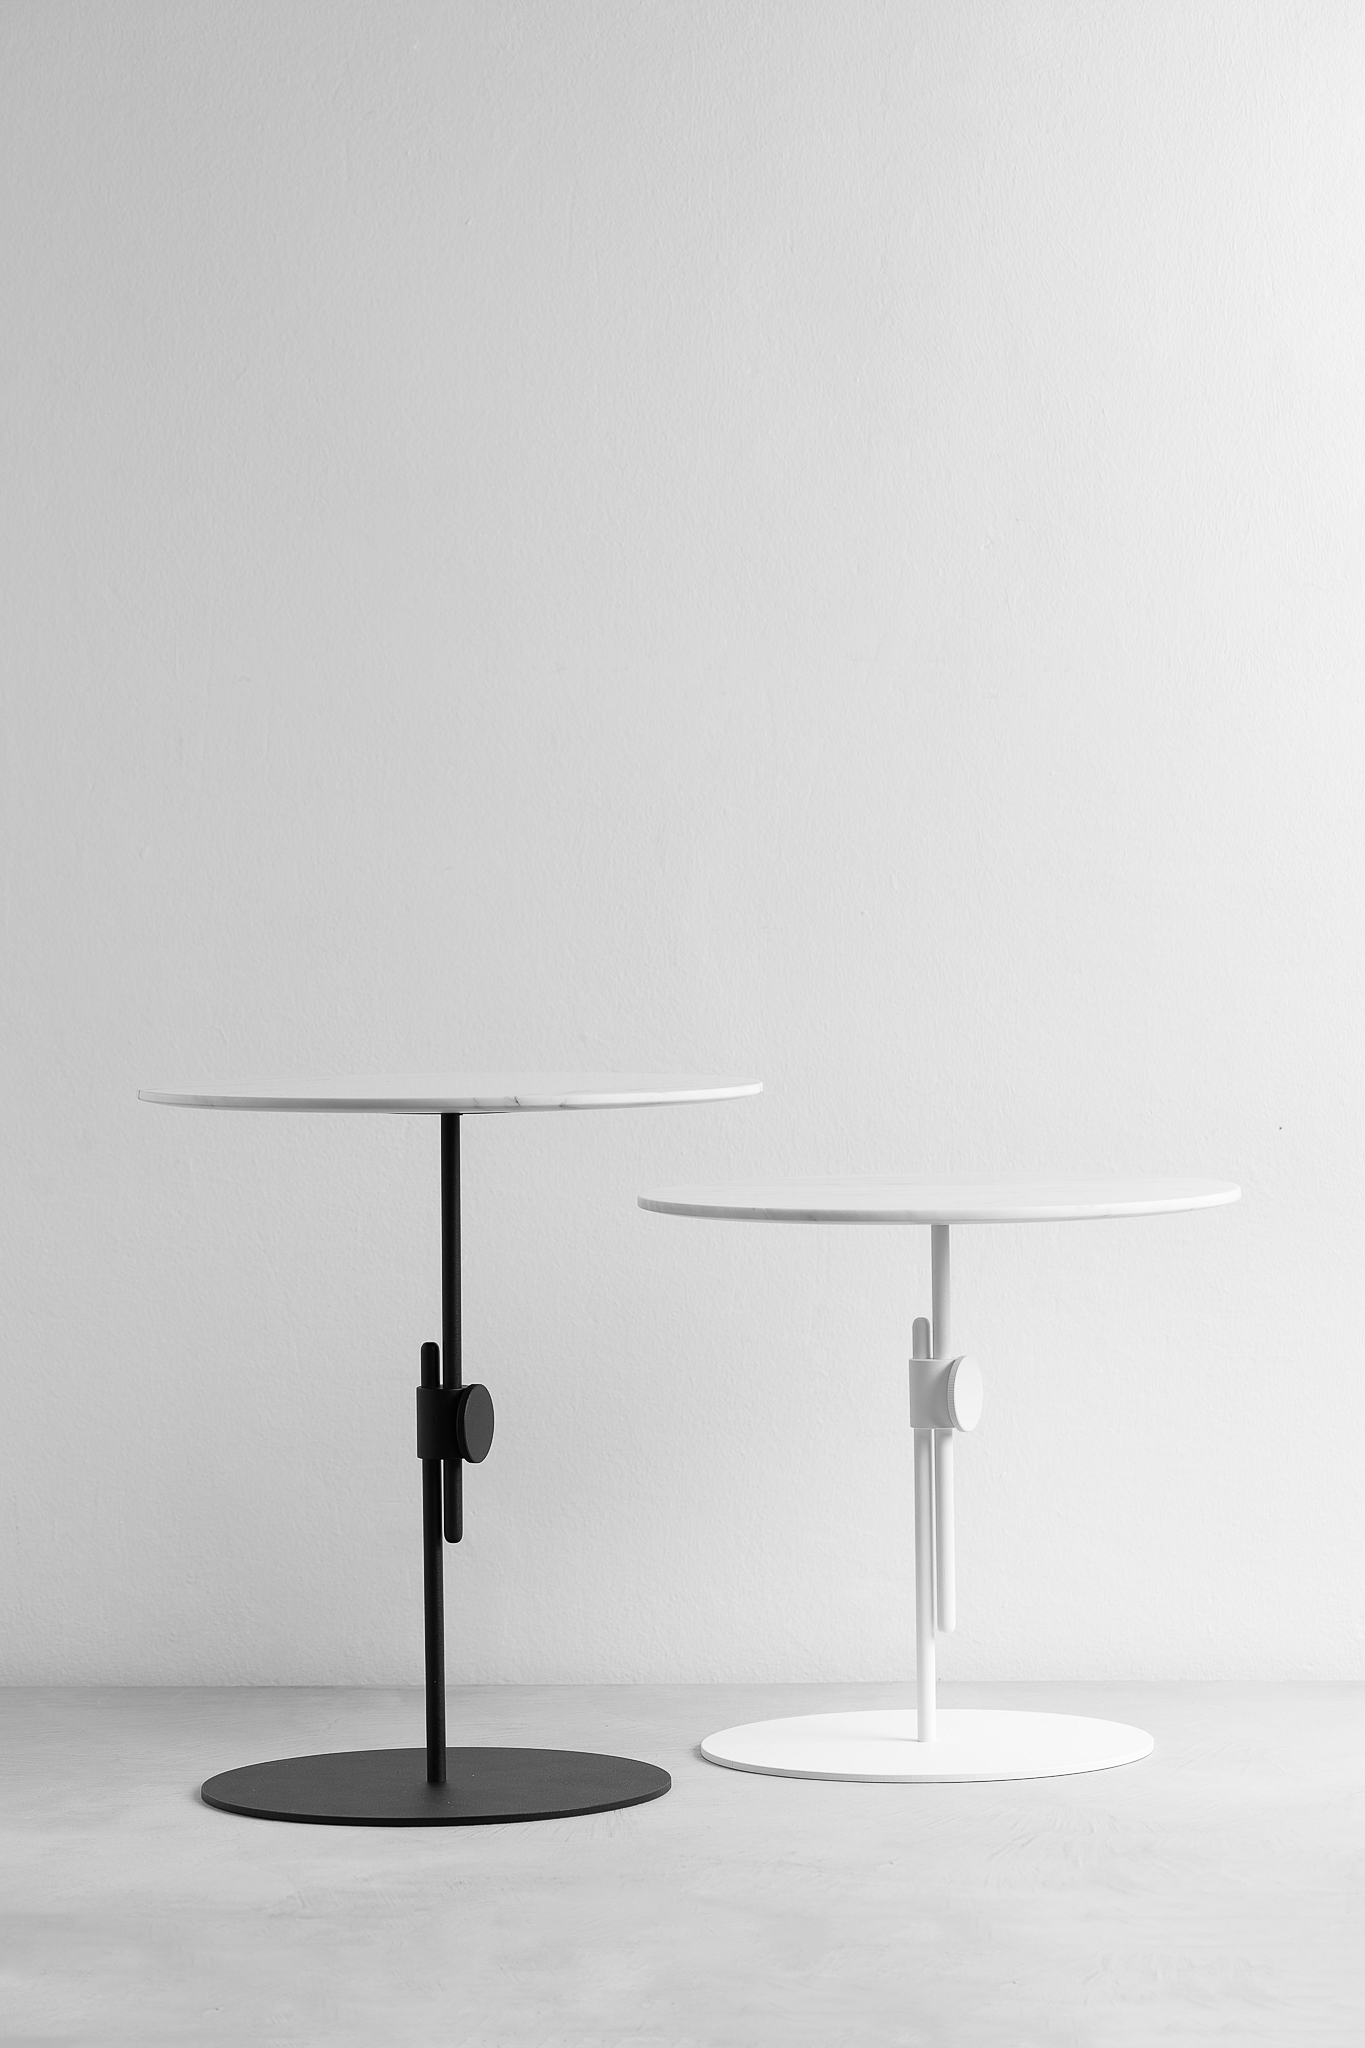 Level Side Table - designed by Regular Company__photo Gasparovic _ Dugandzic - 1.jpg